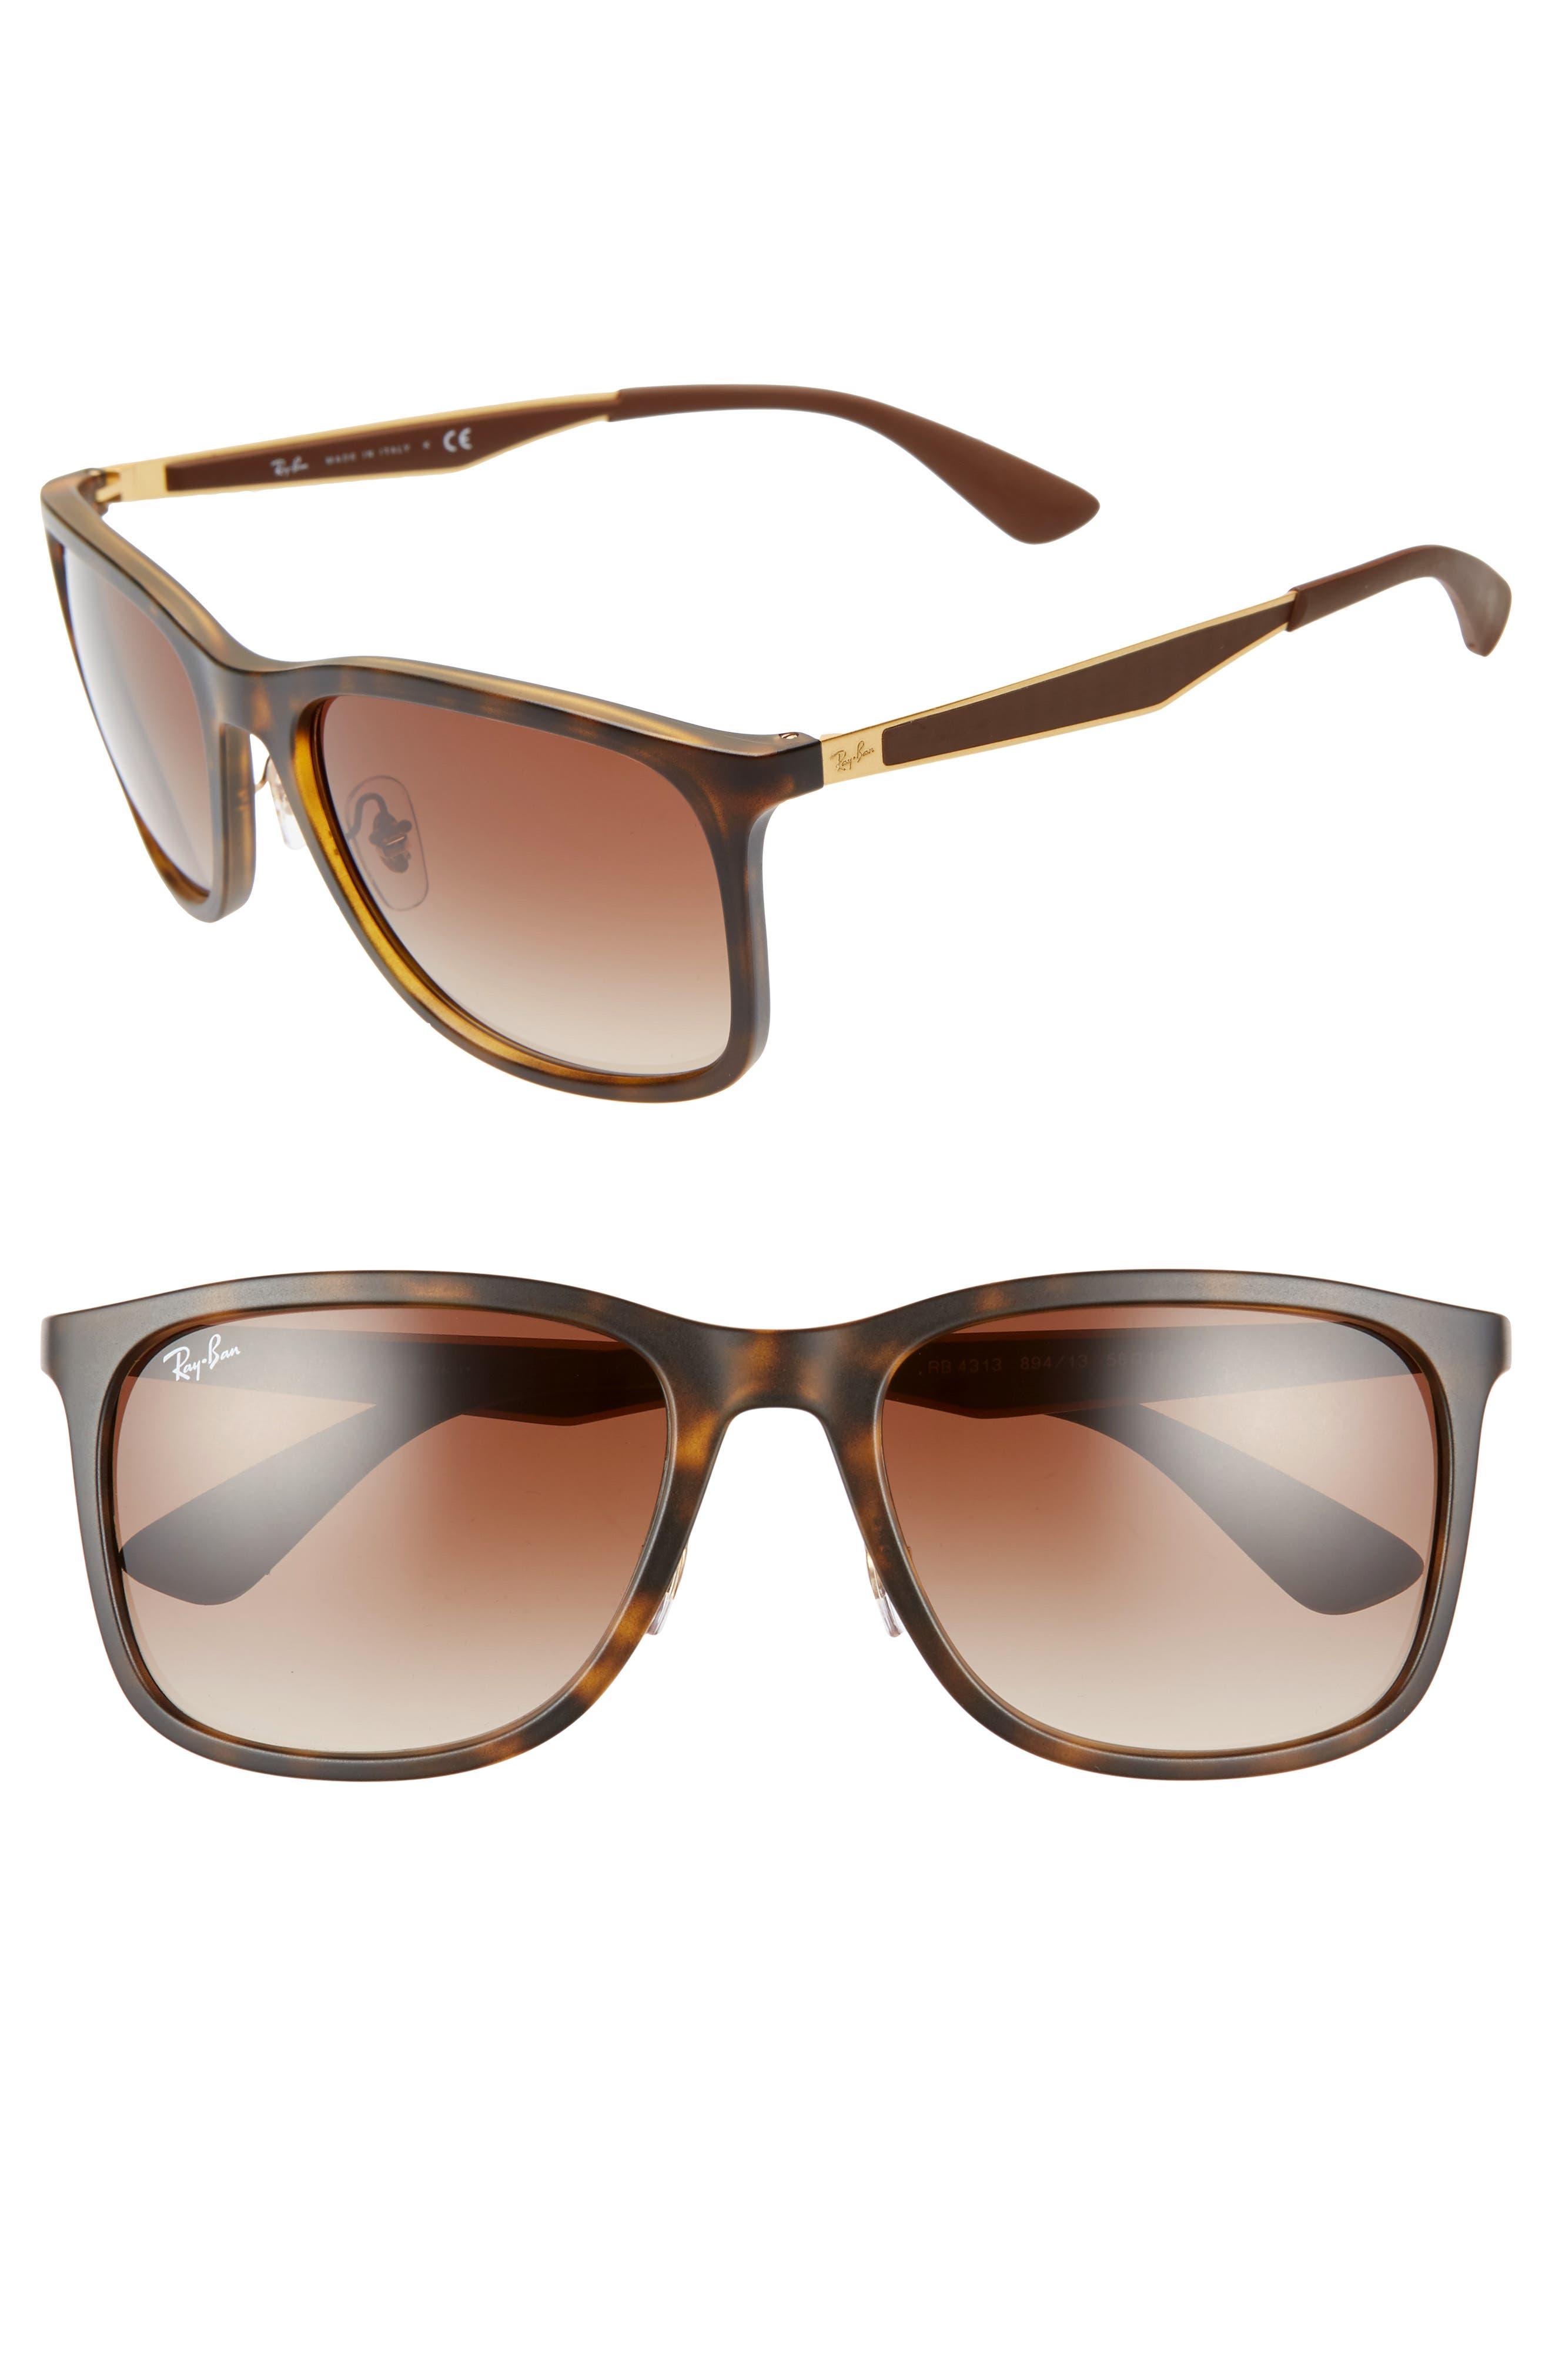 Ray-Ban 5m Sunglasses - Matte Havana